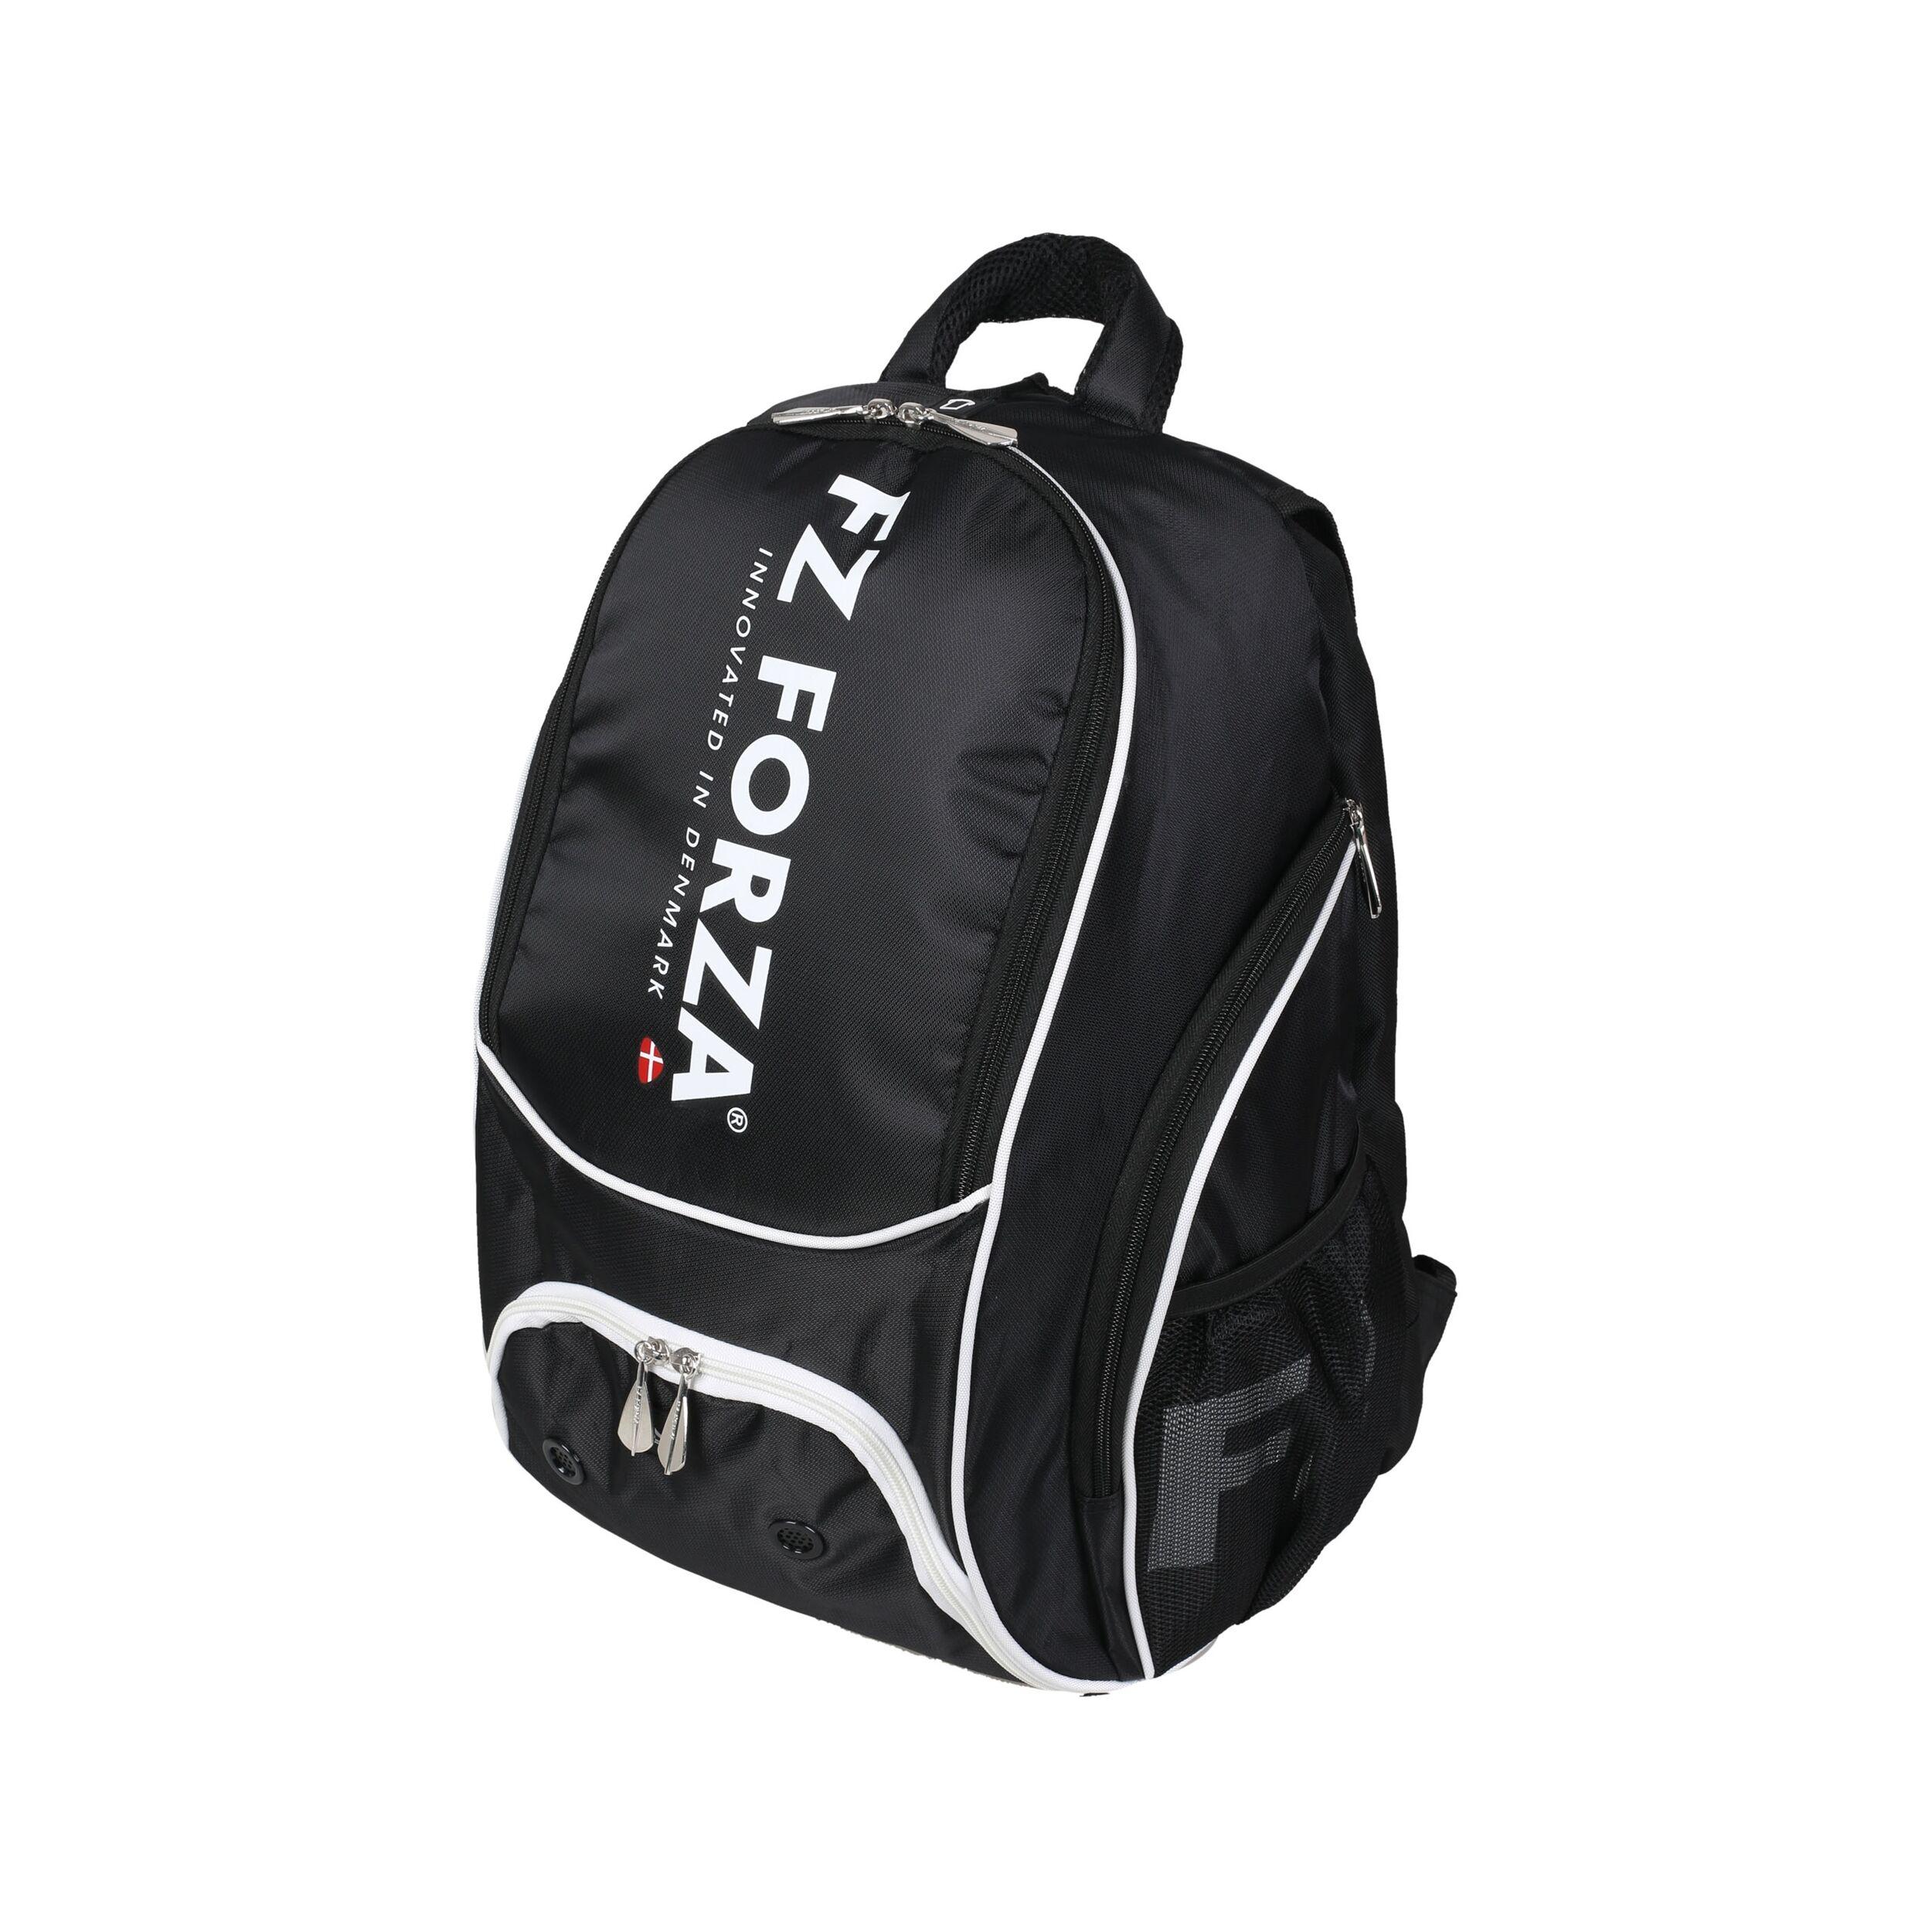 FZ Forza Lennon Backpack Black Edition